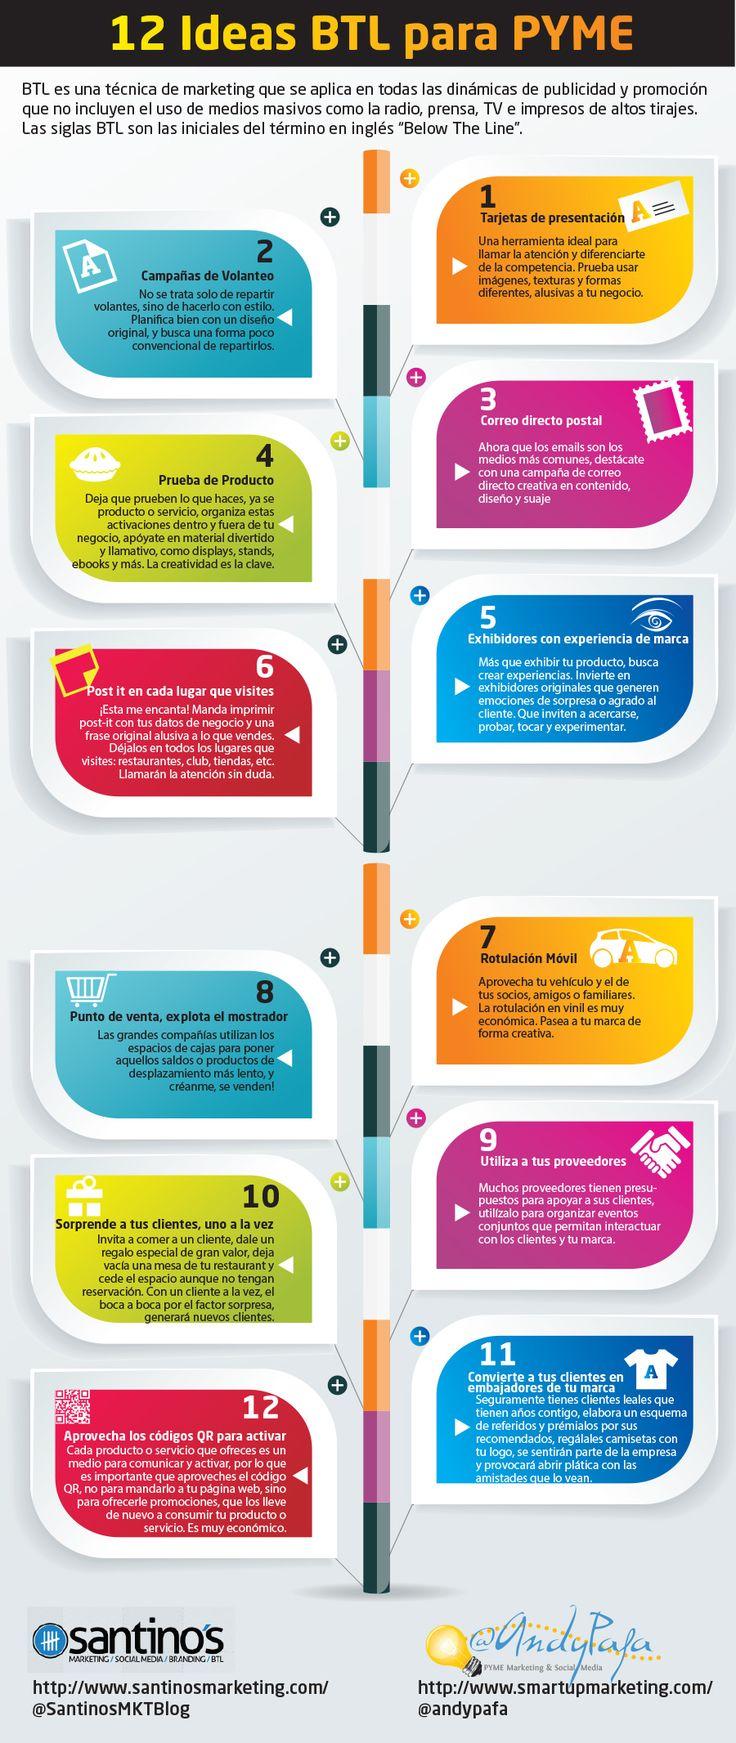 #Infografia #Marketing 12 ideas BTL para Pymes